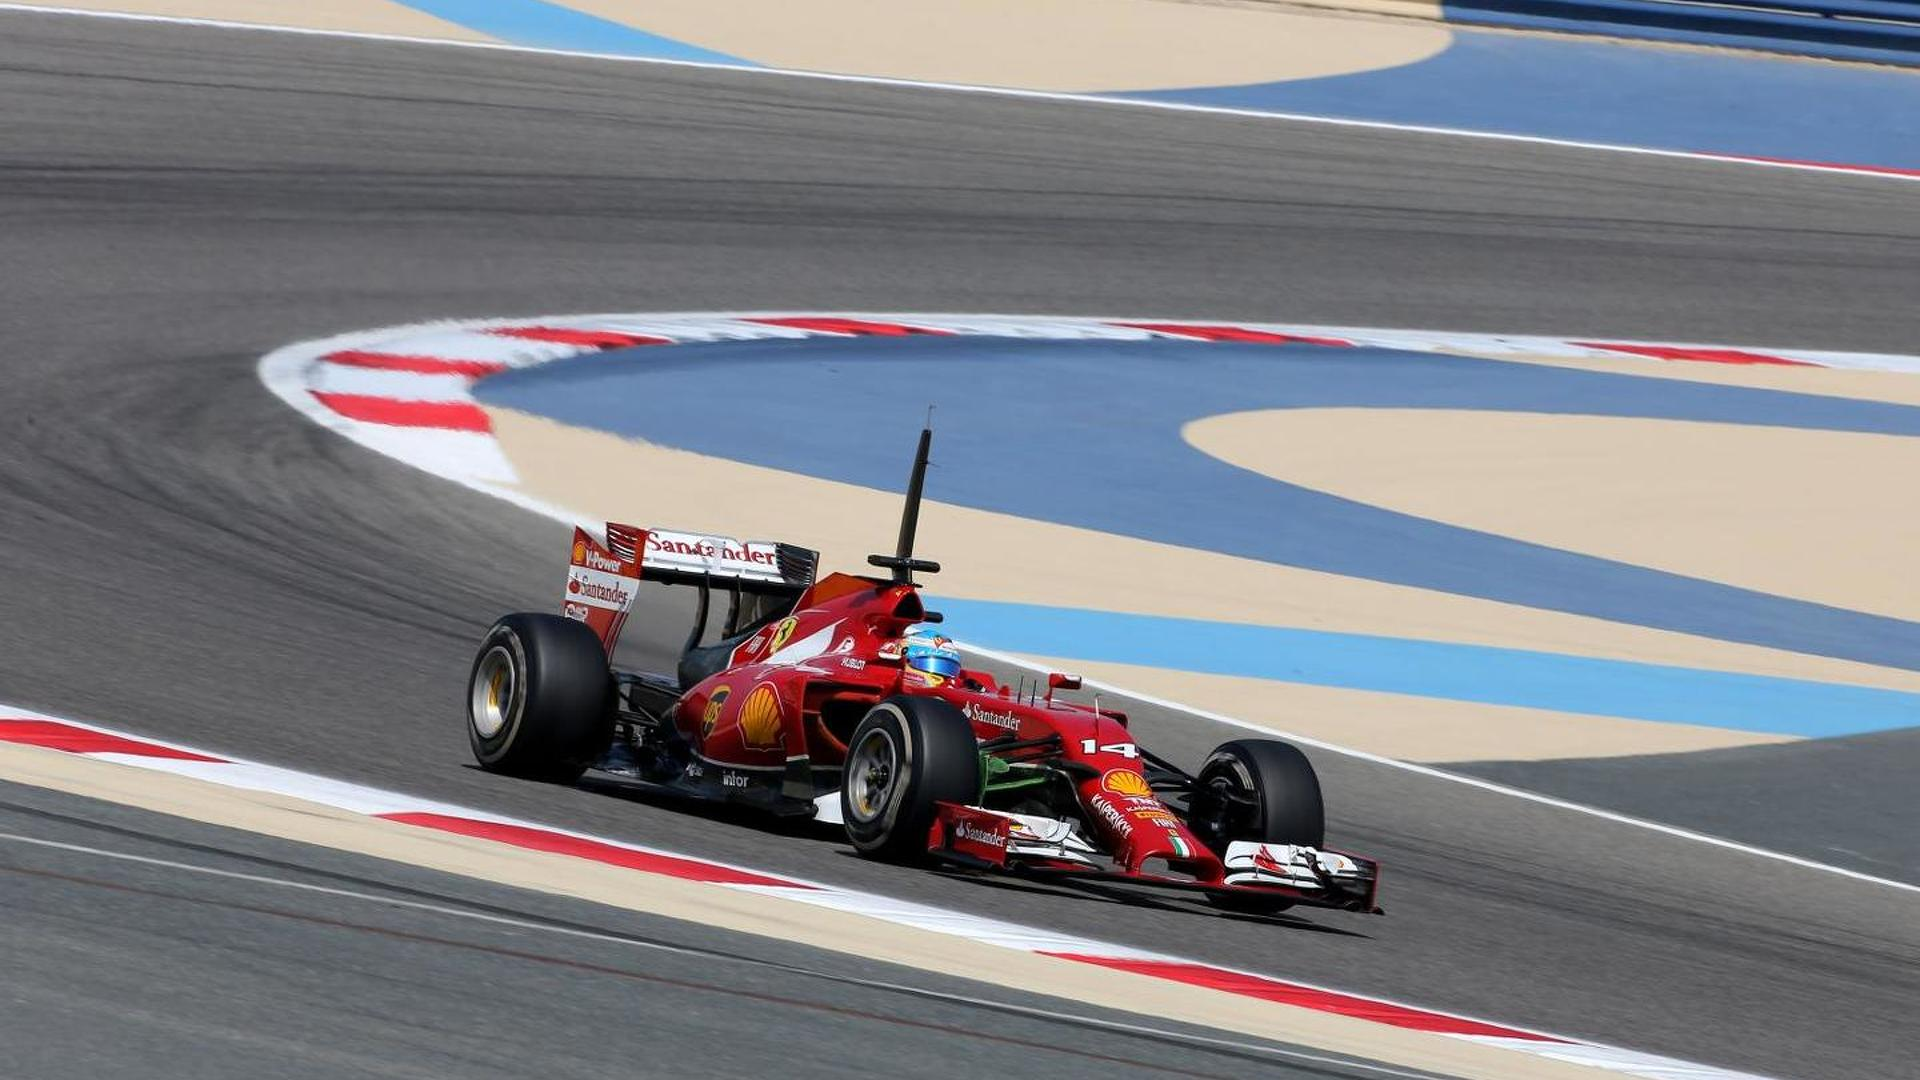 Ferrari problems continue, ends Bahrain test early